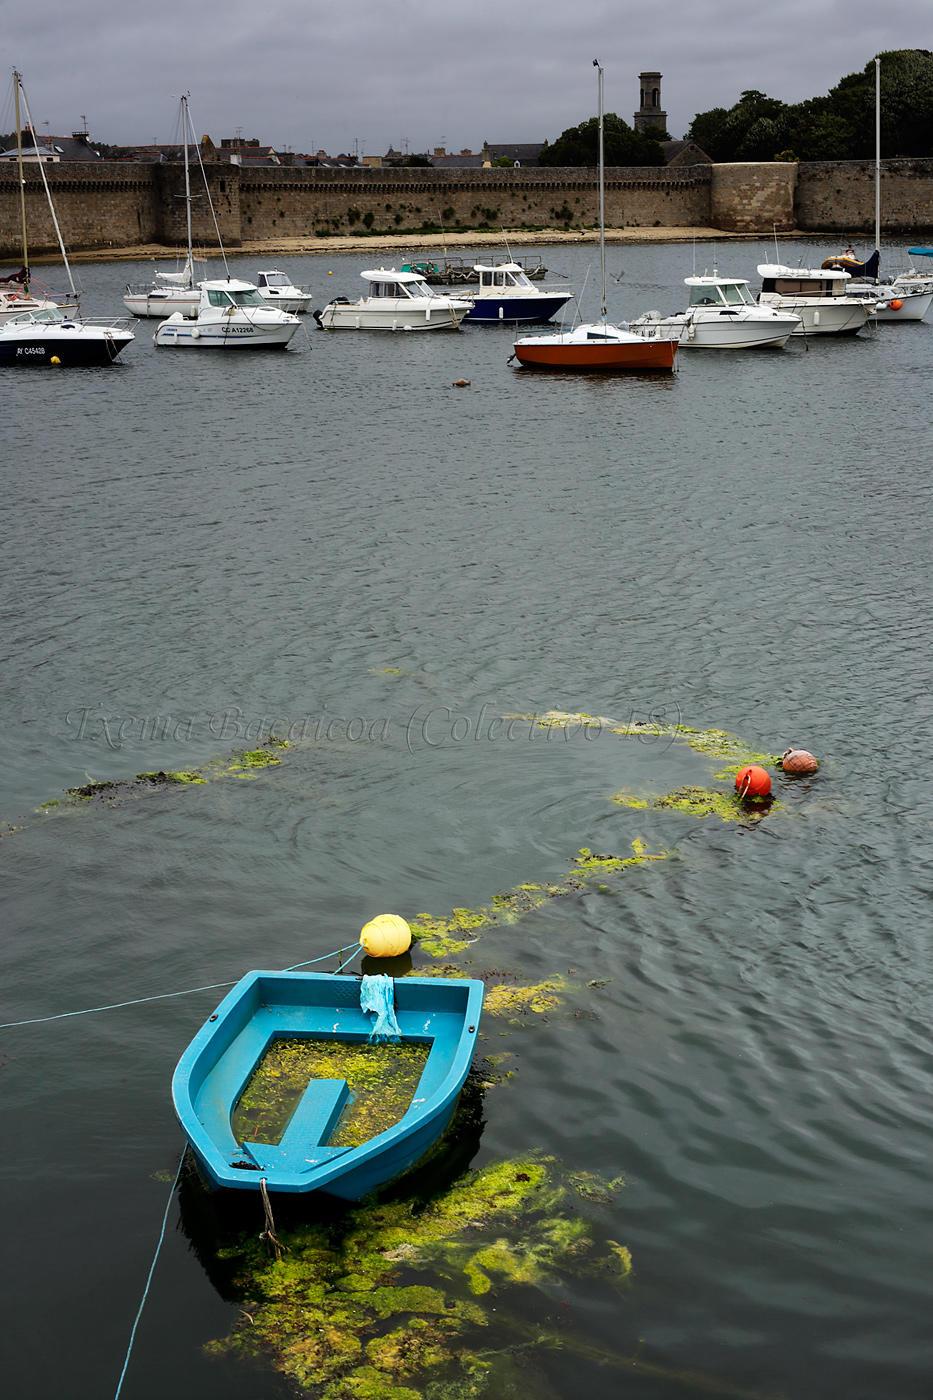 El esquife azul (Txema Bacaicoa (Colectivo IS))